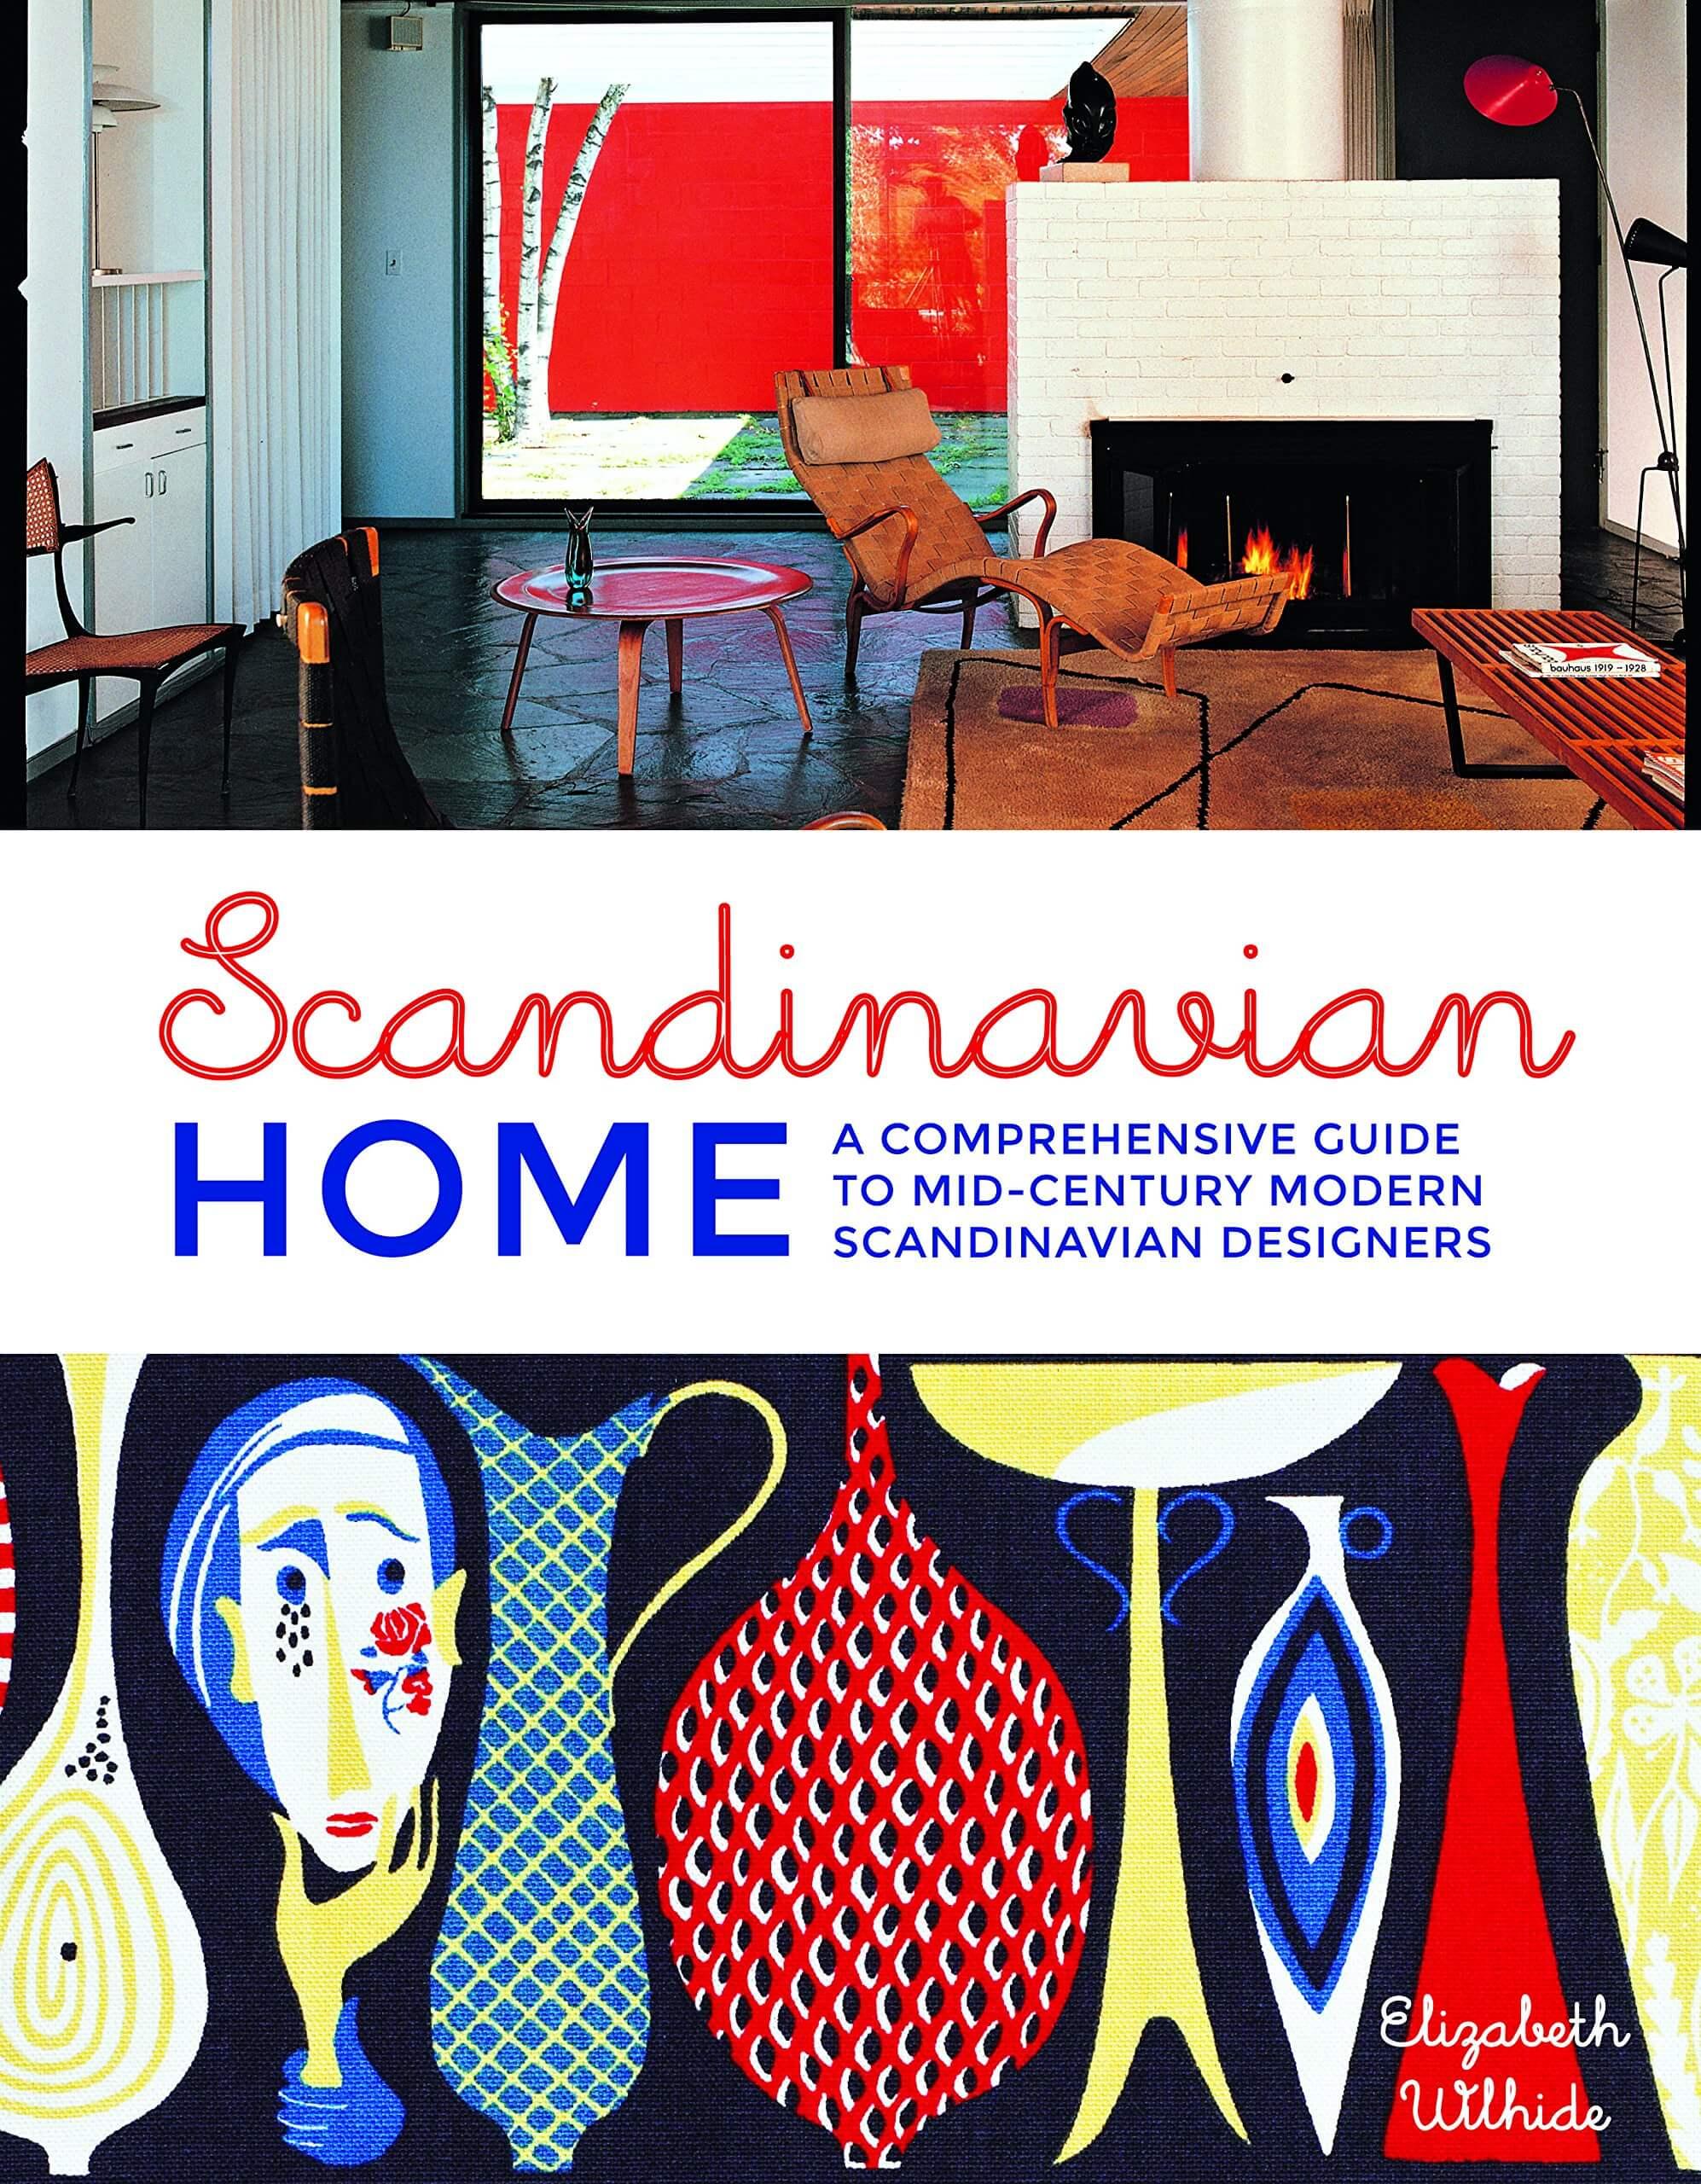 Scandinavian Home book cover image